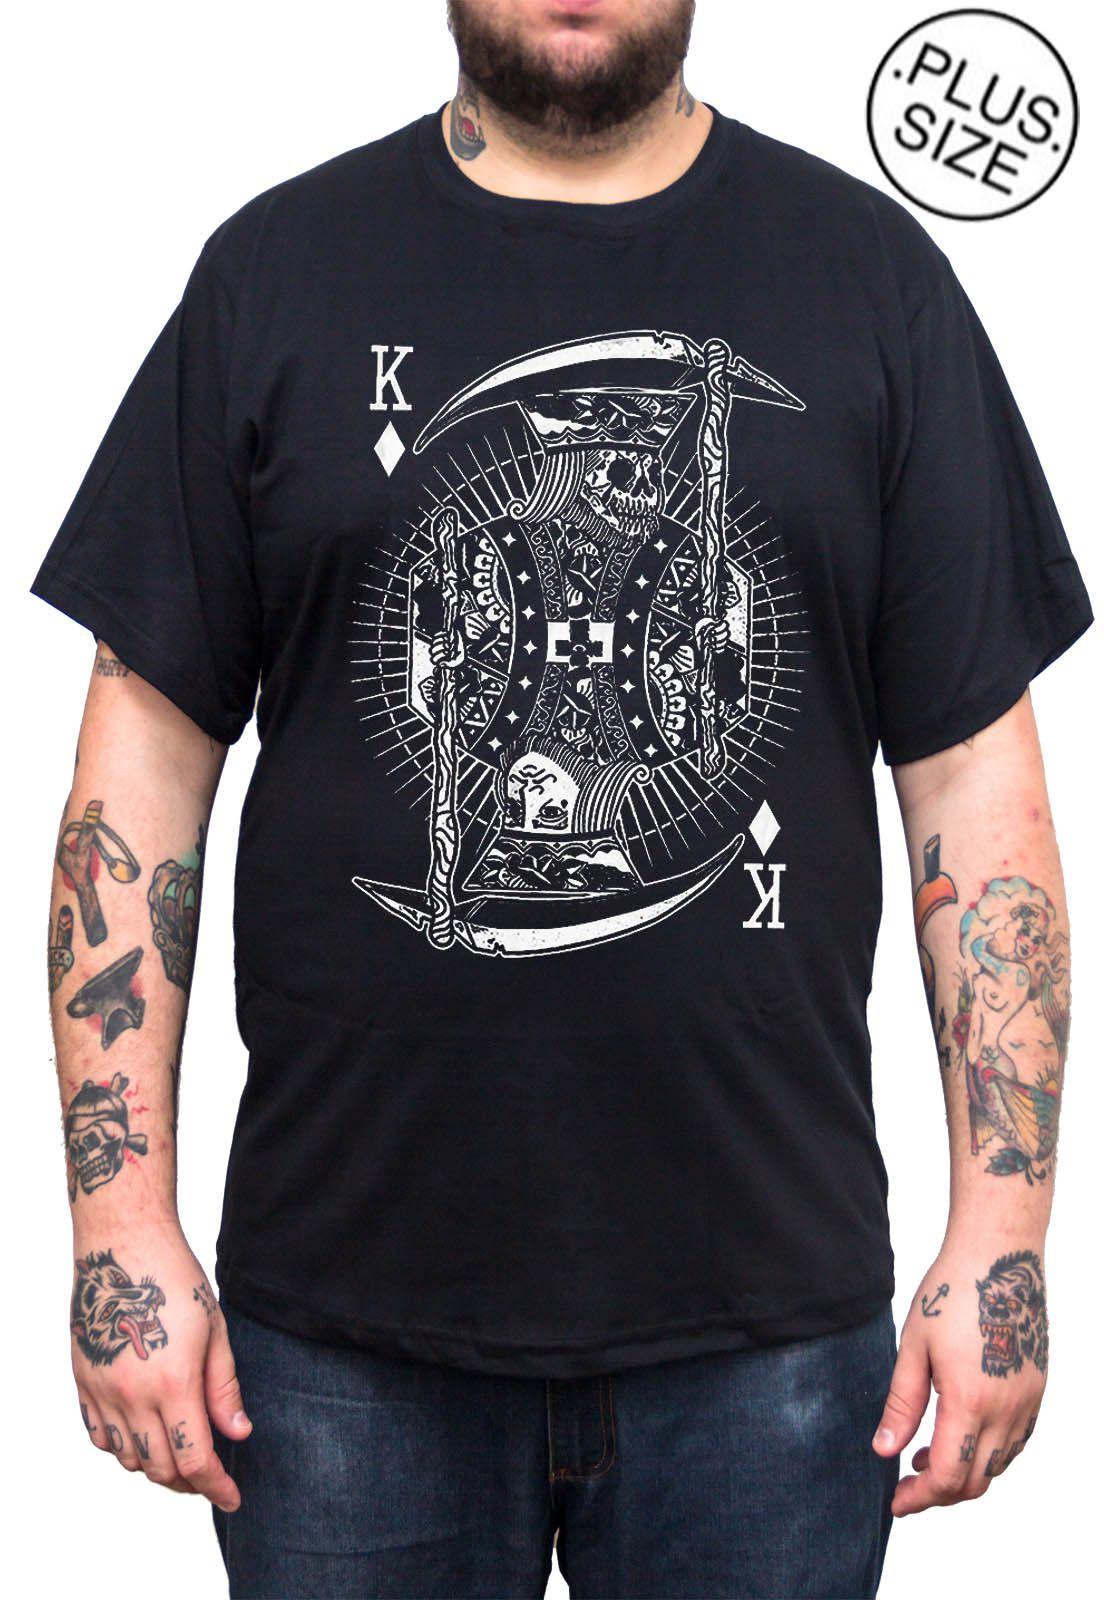 Camiseta Hshop Rei Caveira - Preto - Plus Size - Tamanho Grande XG  - HShop